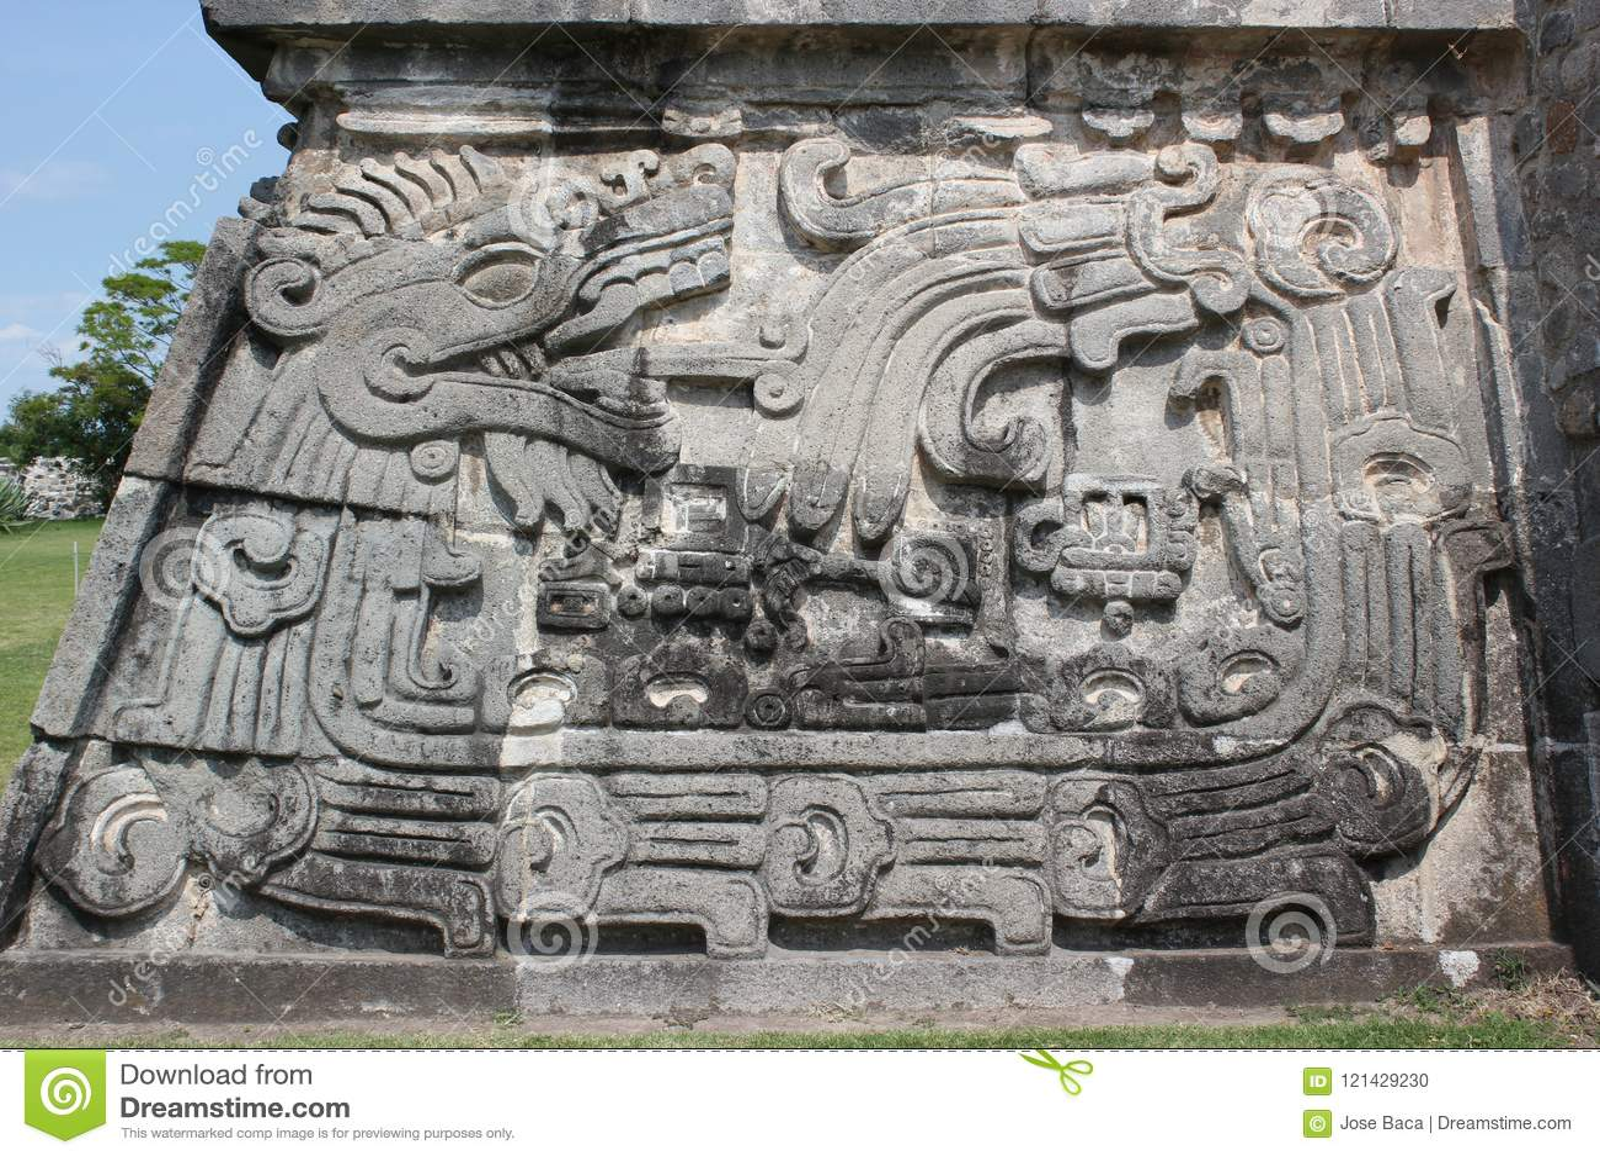 Xochicalco the One Quetzalcoatl